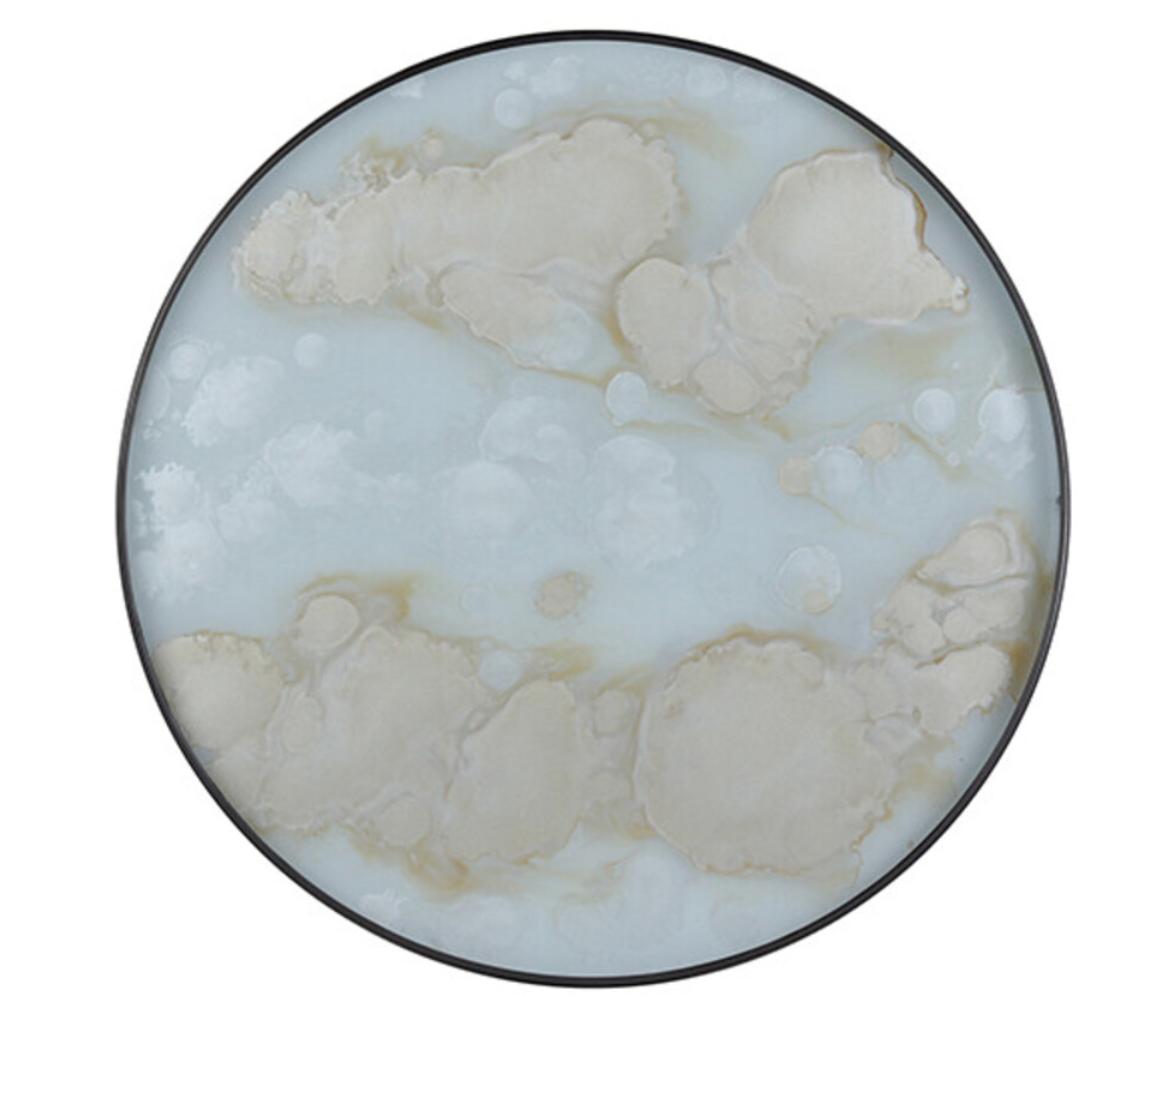 Mist gold organic glass tray-1